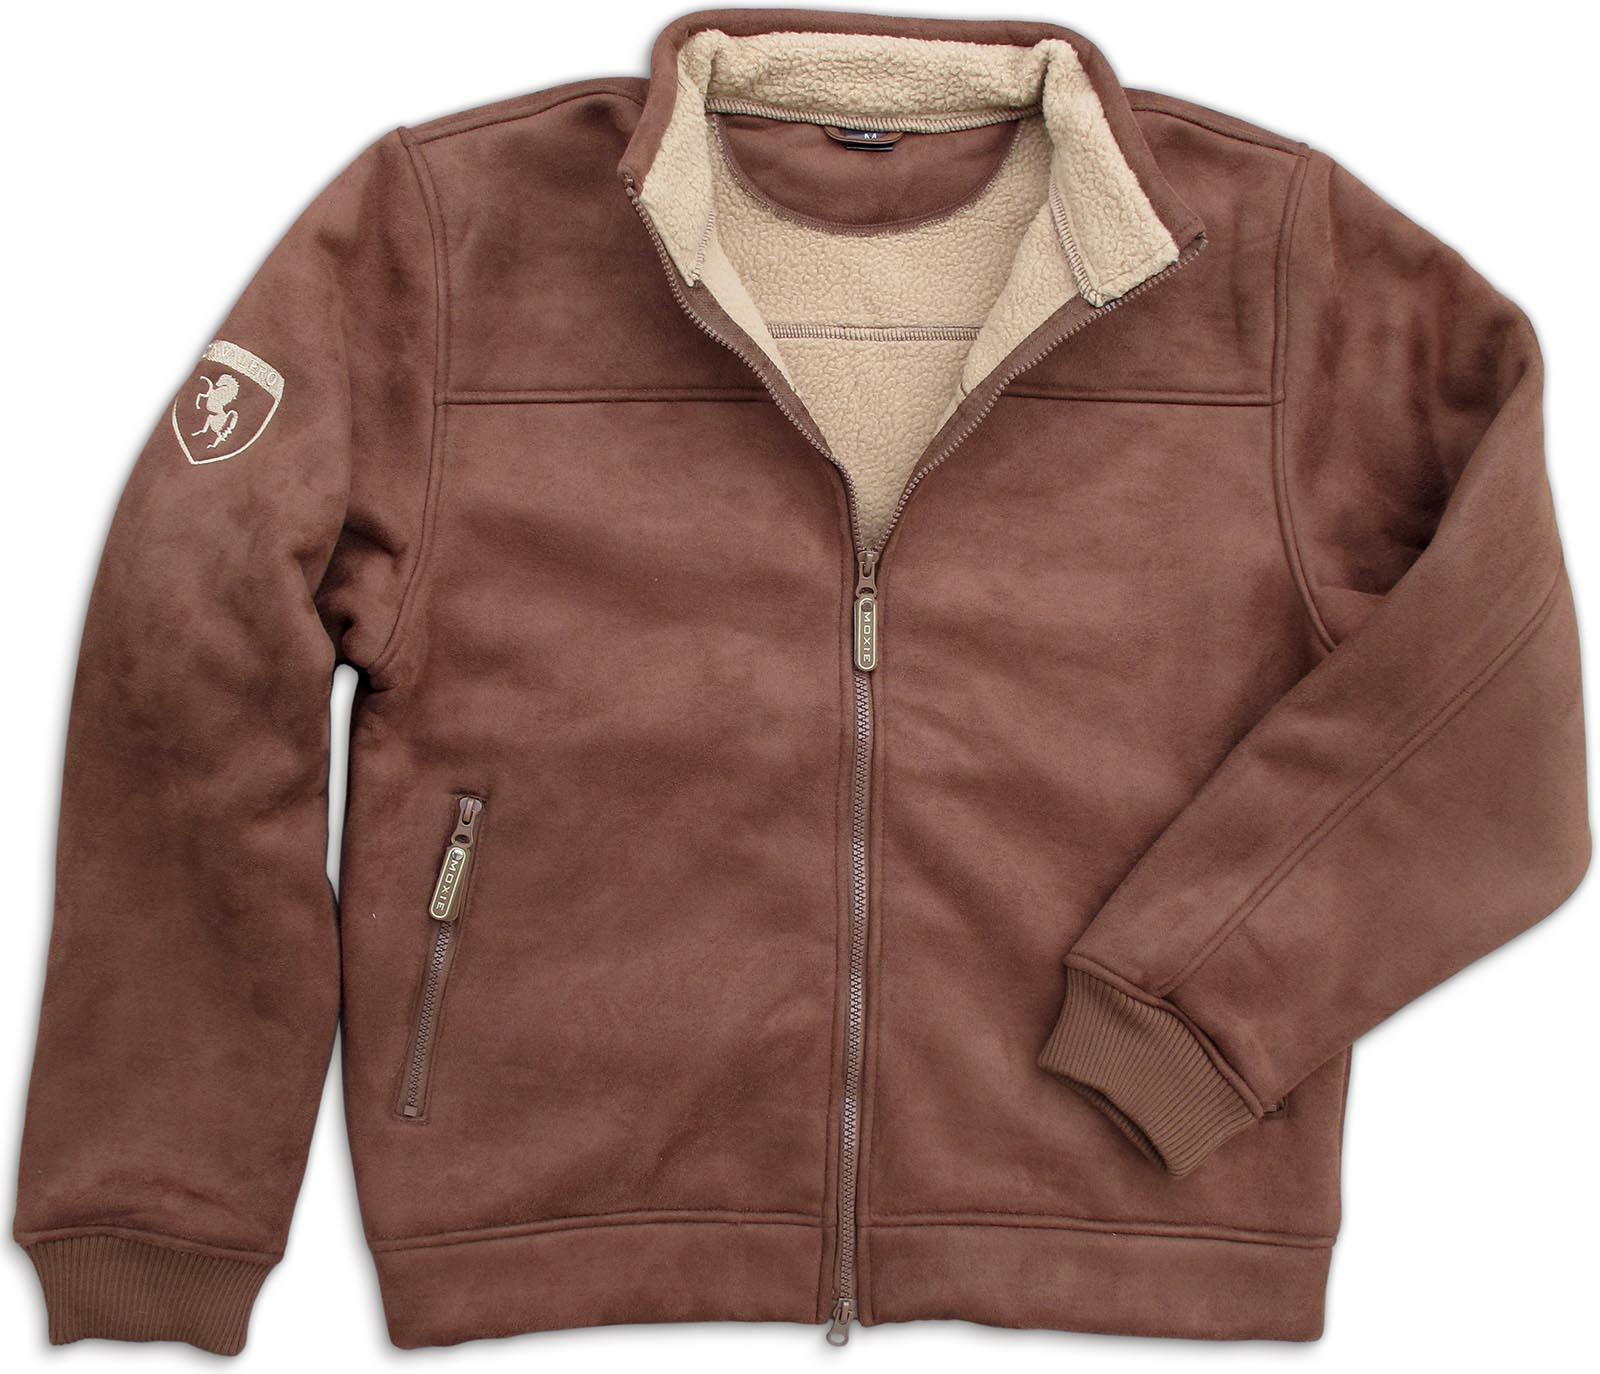 ** SOLD OUT ** Fleece Lined Suede Bomber Jacket-www.hoofprints.com